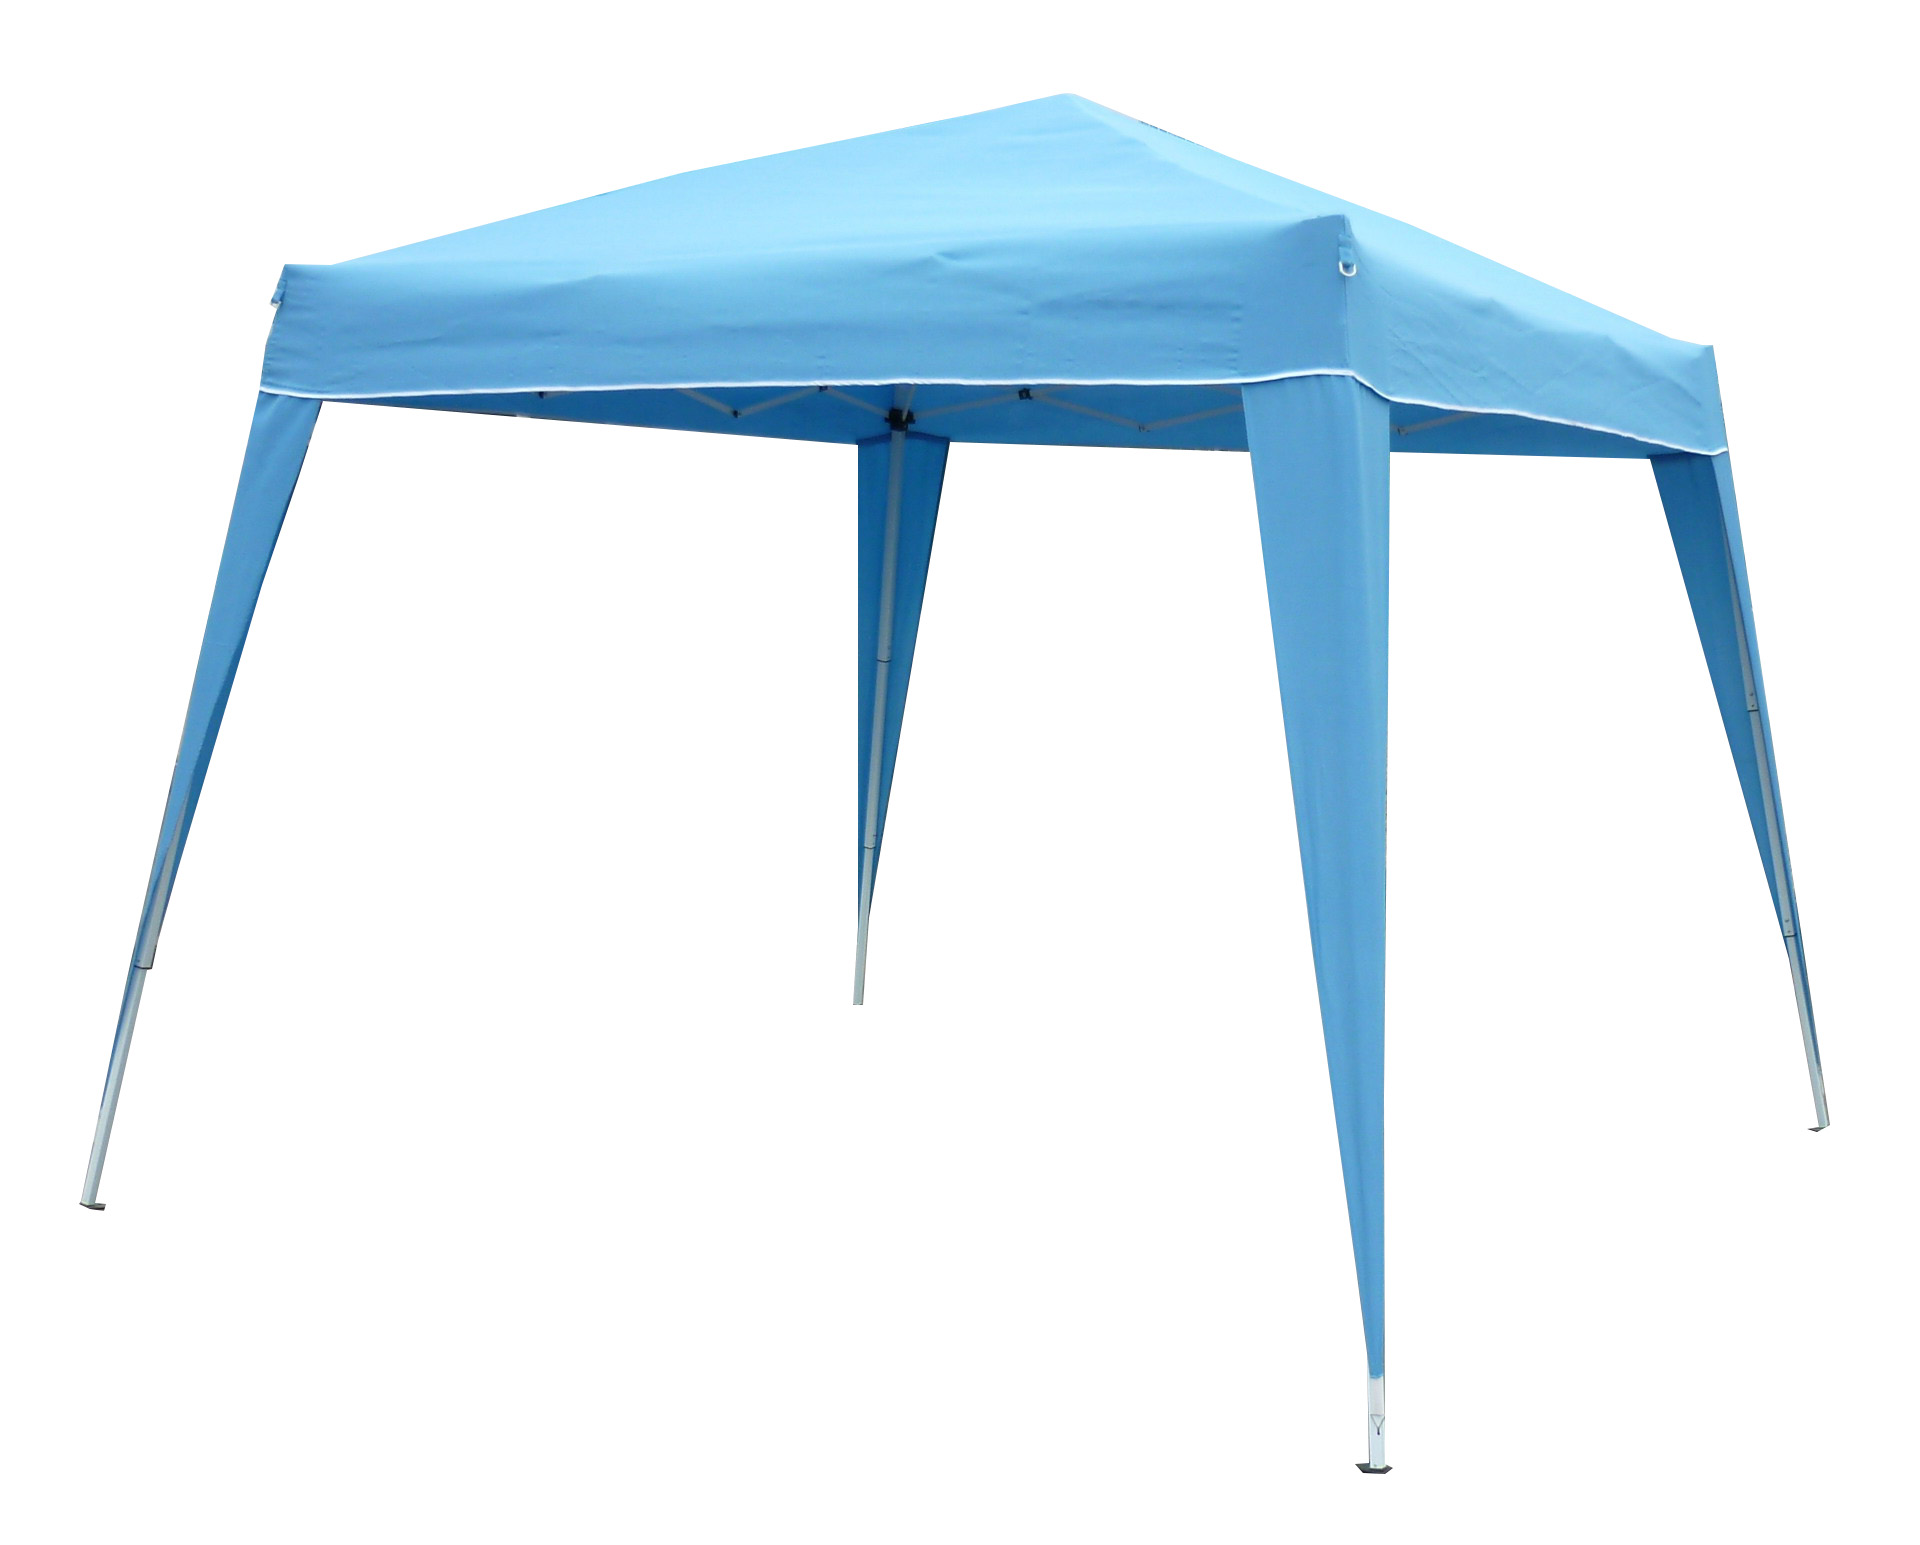 3x3 wholesale outdoor folding metal gazebo tent garden gazebo canopy outdoor gazebo